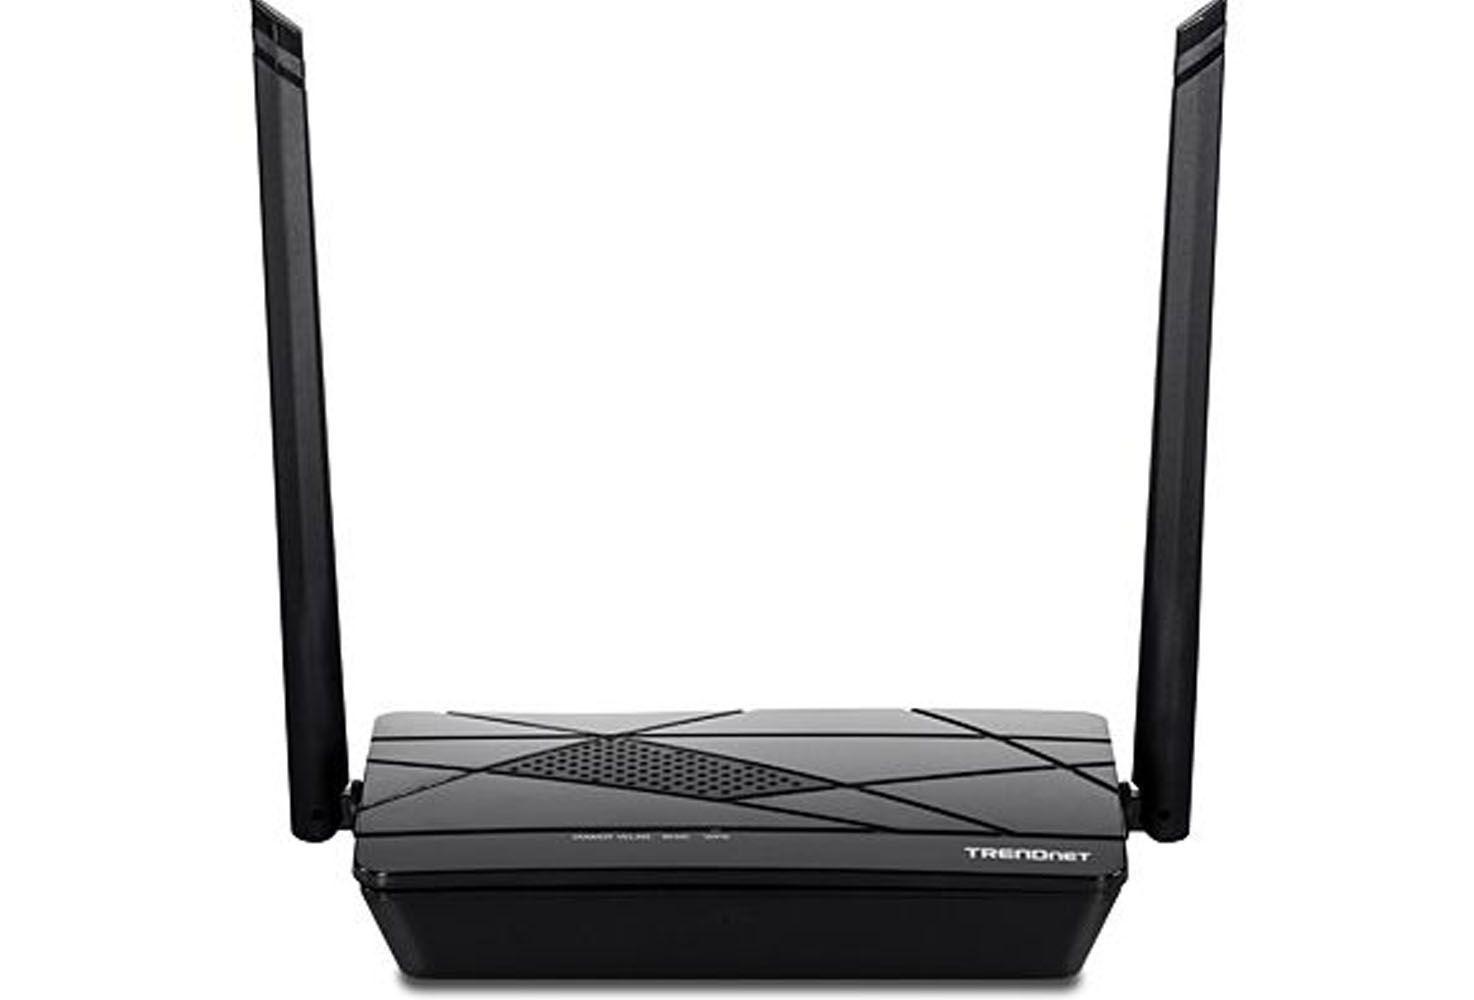 Roteador Wifi 300Mbps 2 Antenas Trendnet